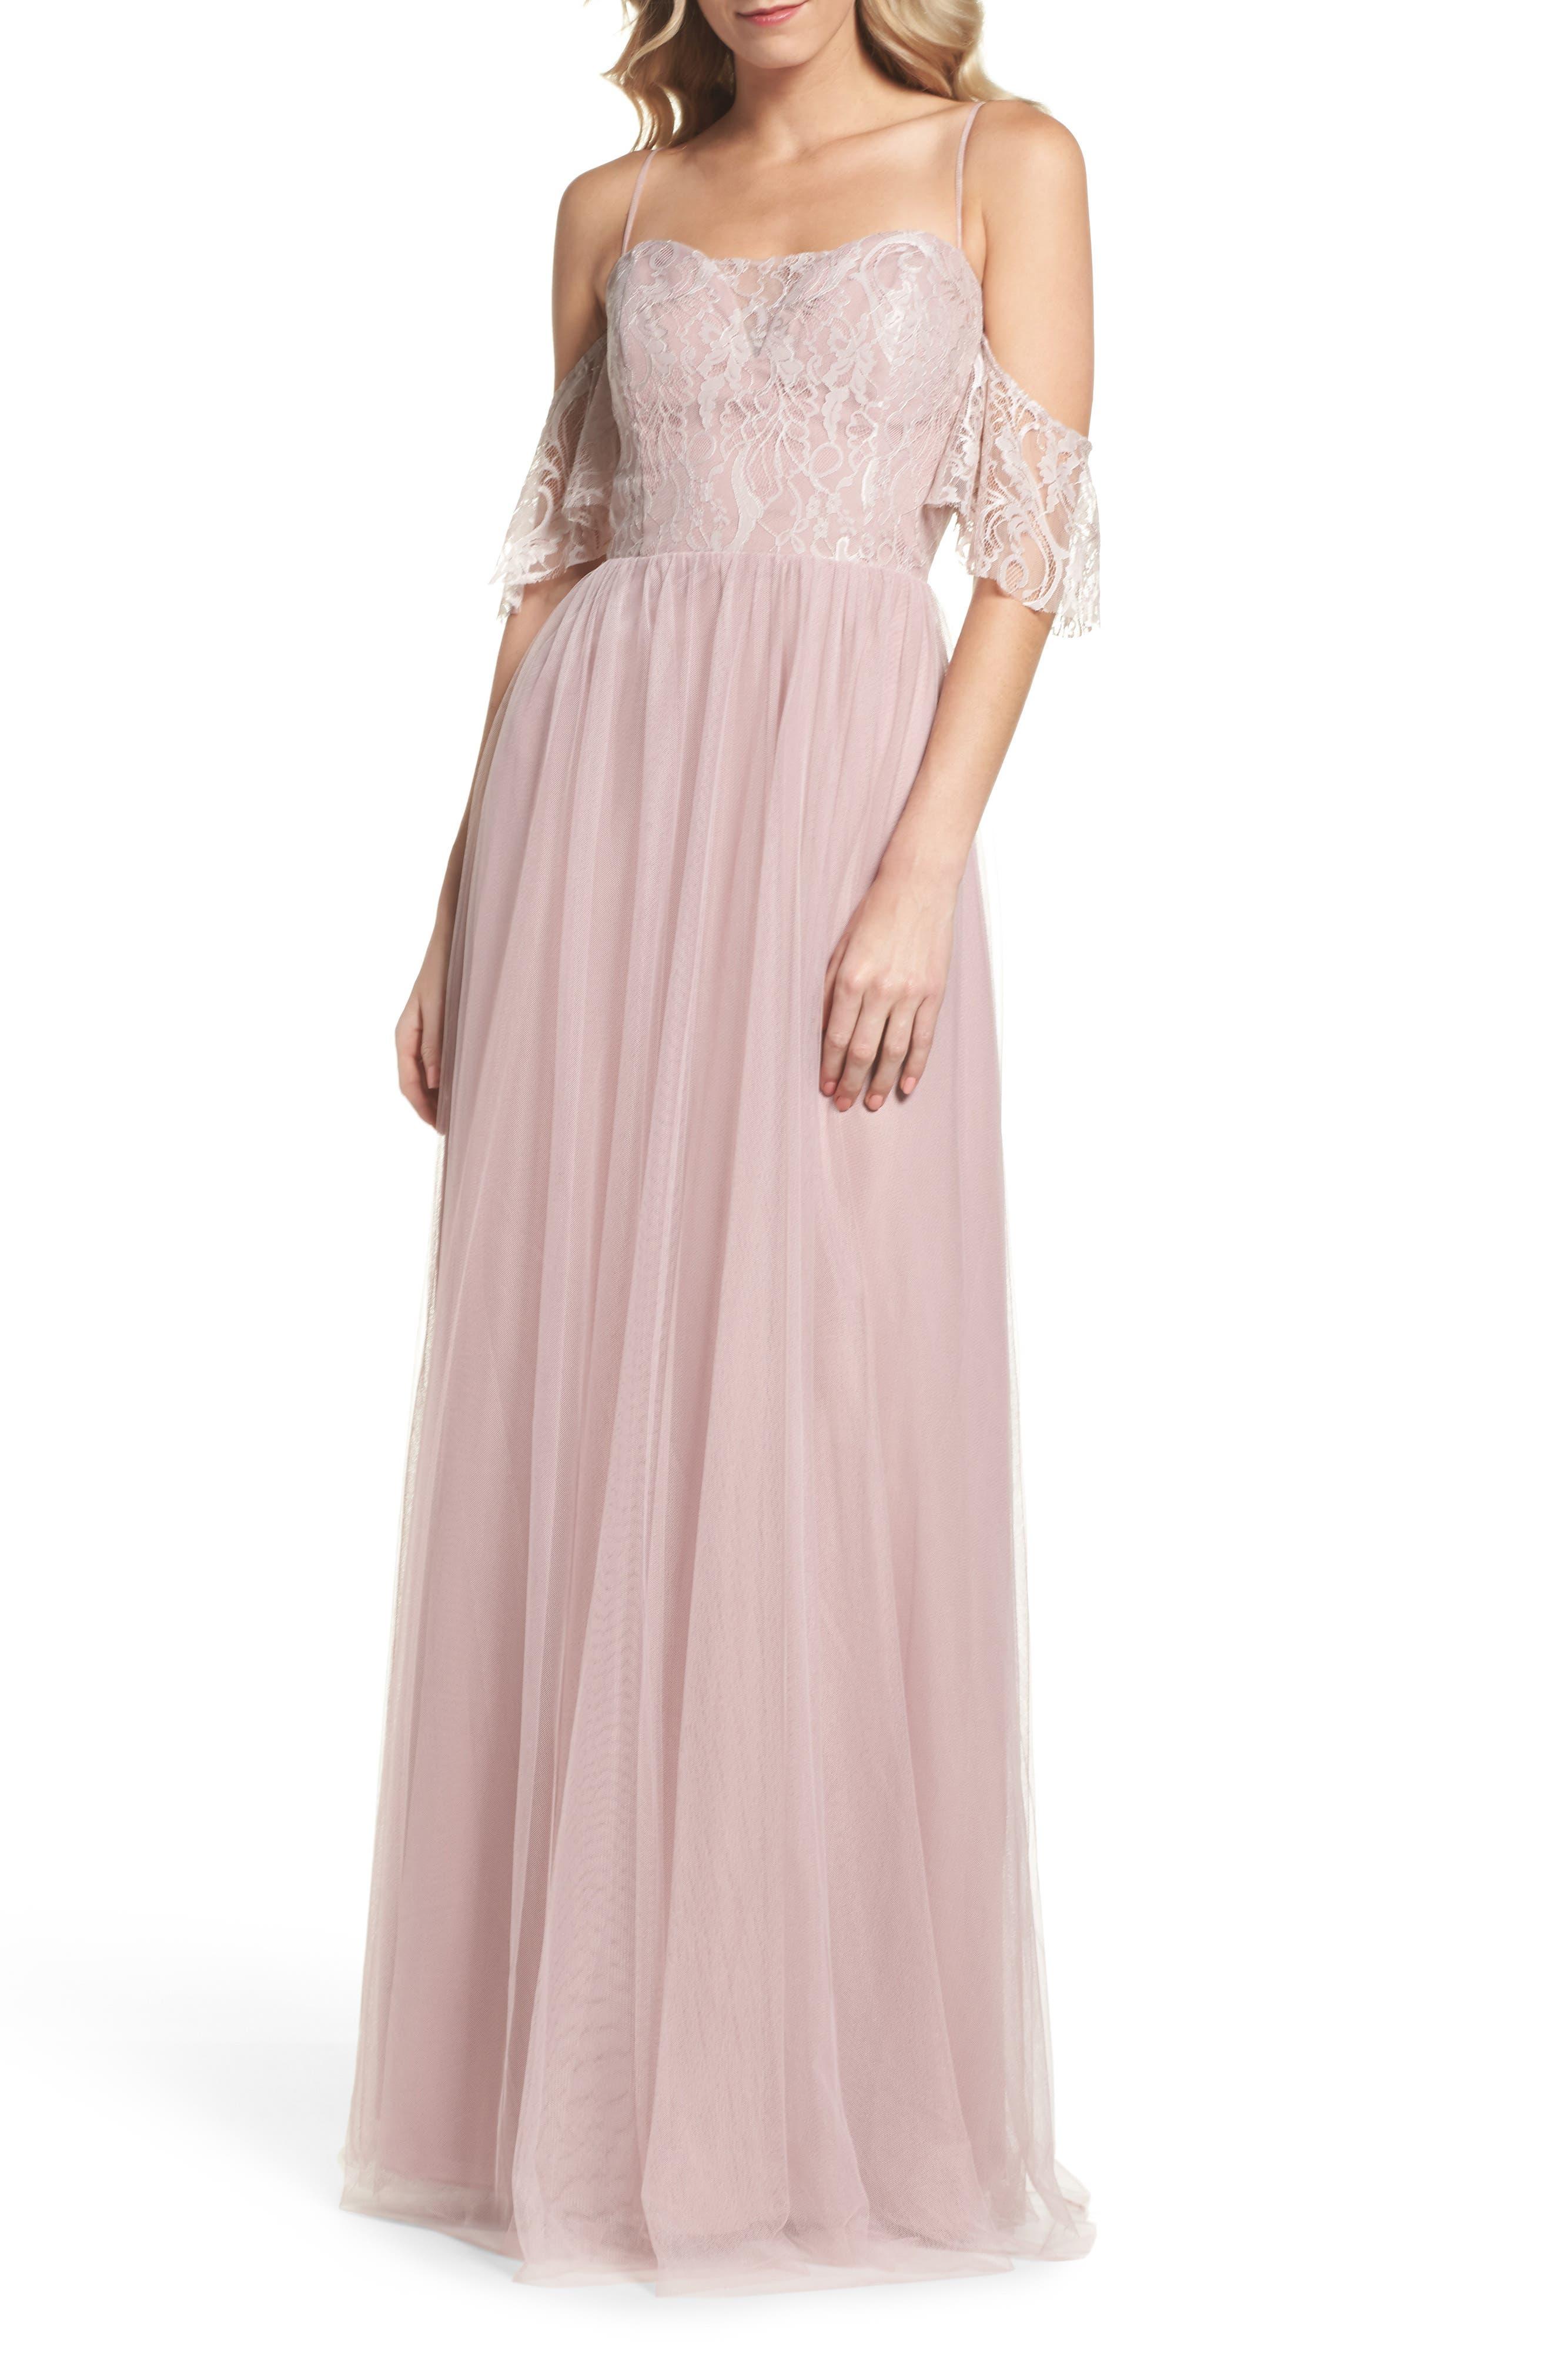 Cold Shoulder Lace Gown,                         Main,                         color, Dusty Rose